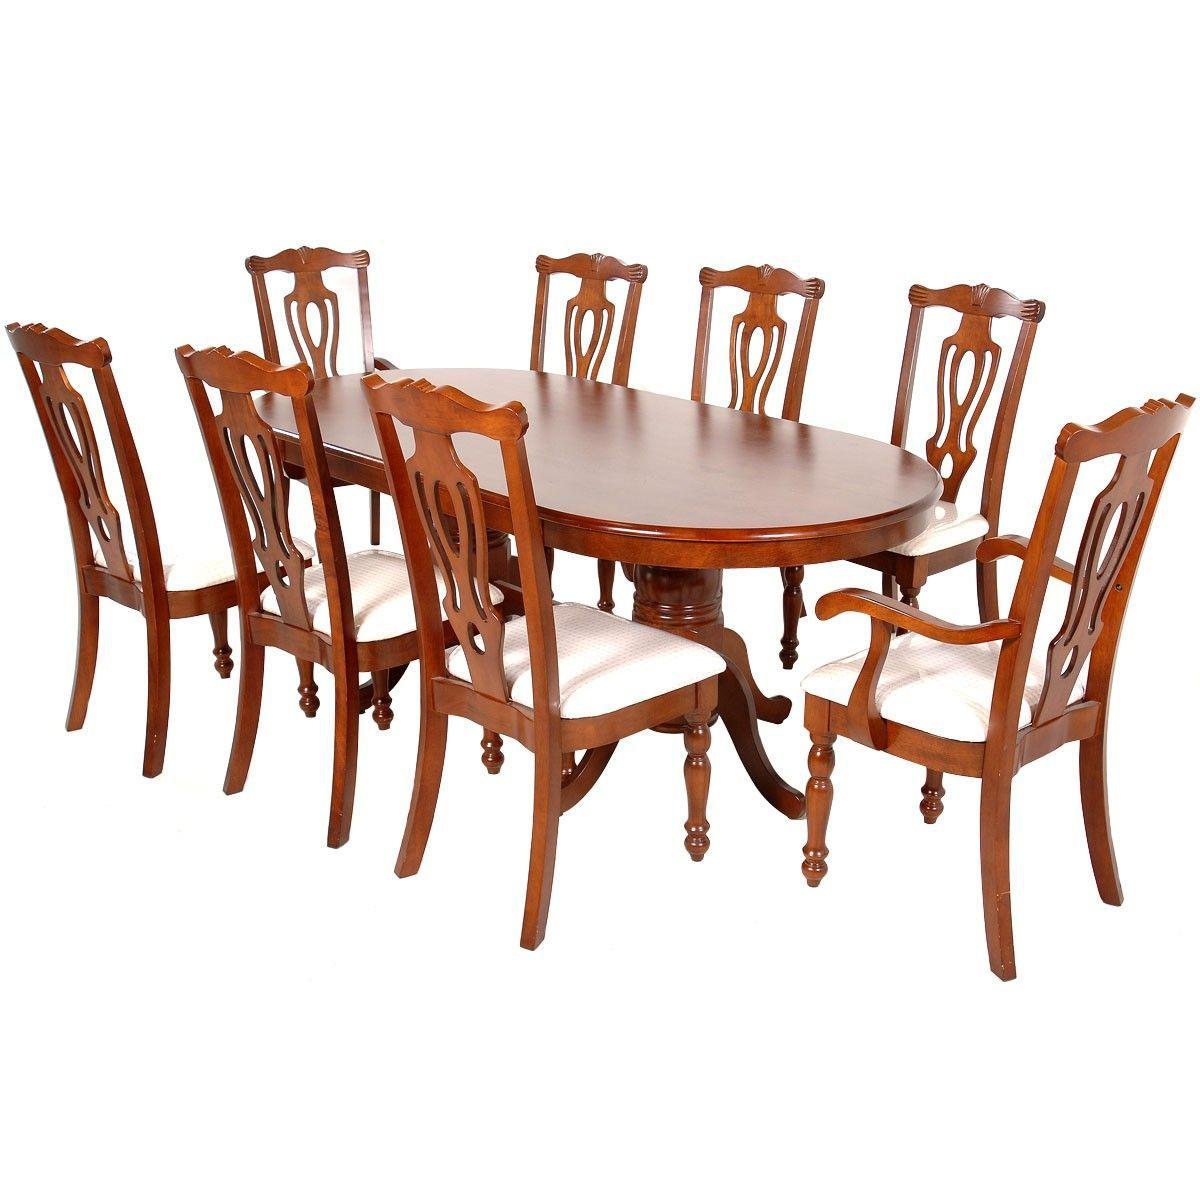 Commodity juego de comedor zoysia 8 sillas sillas for Sillas cromadas para comedor